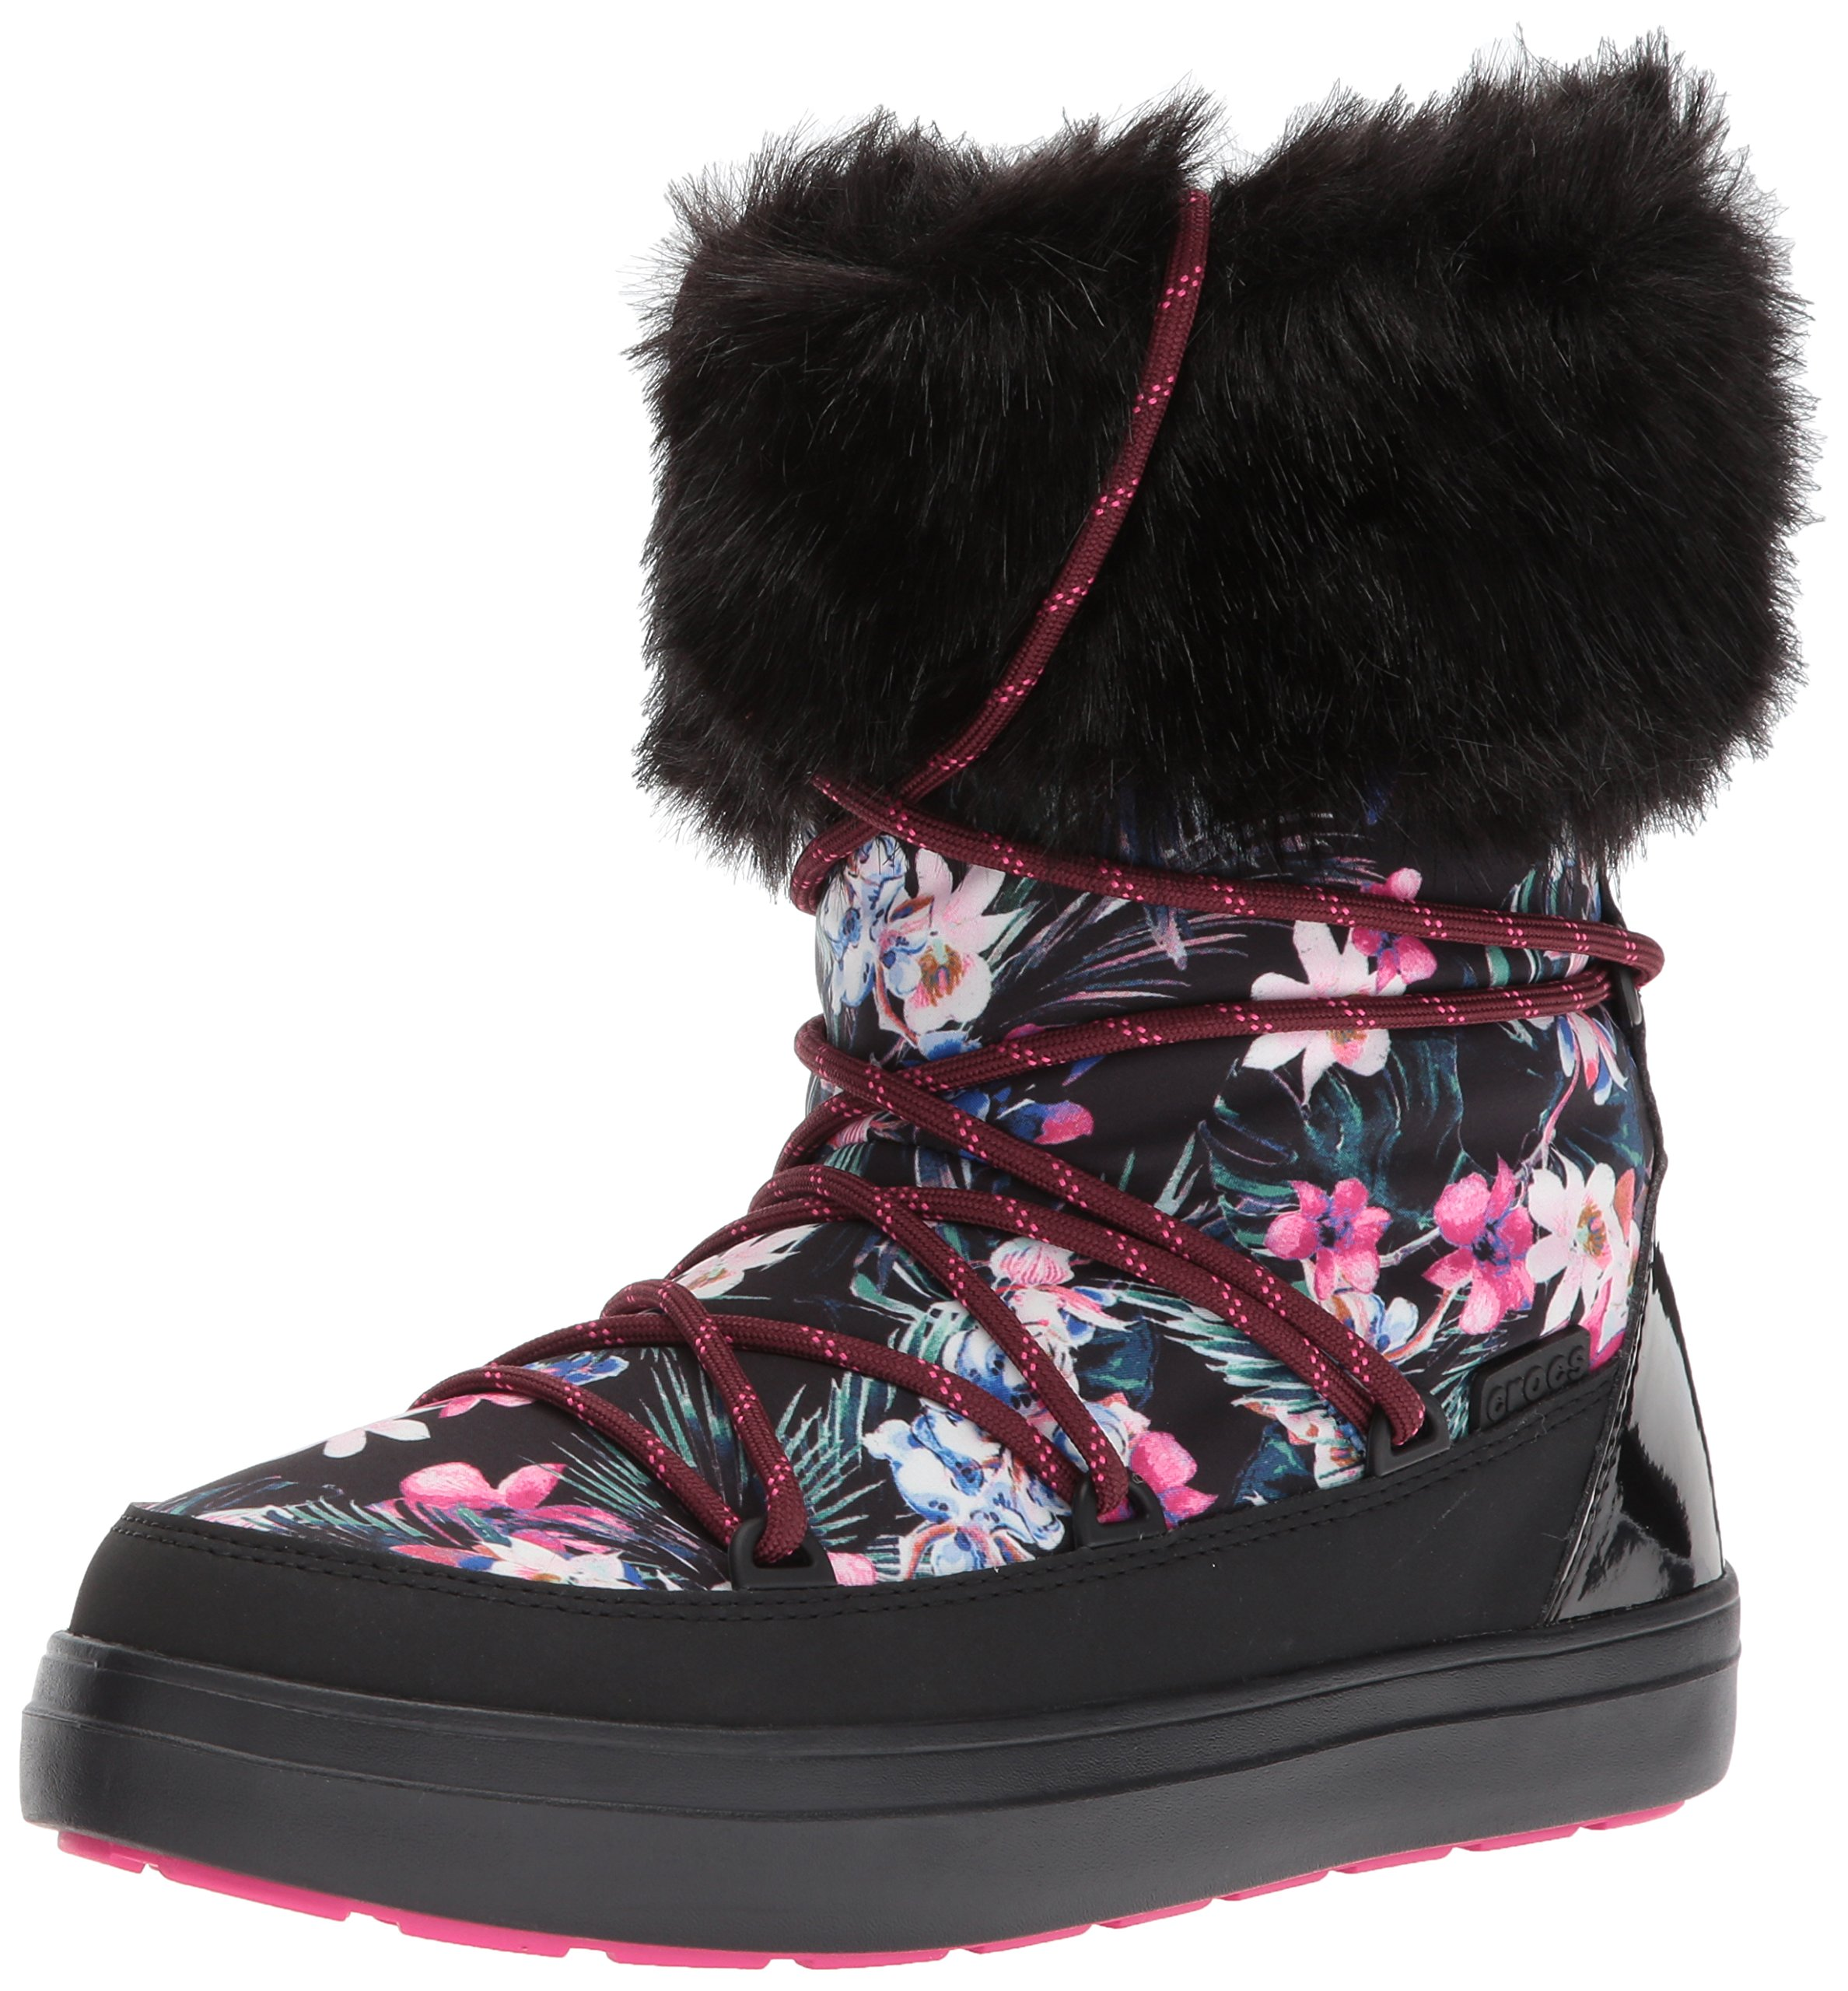 Crocs Women's LodgePoint Graphic Lace W Snow Boot, Tropical/Black, 8 M US